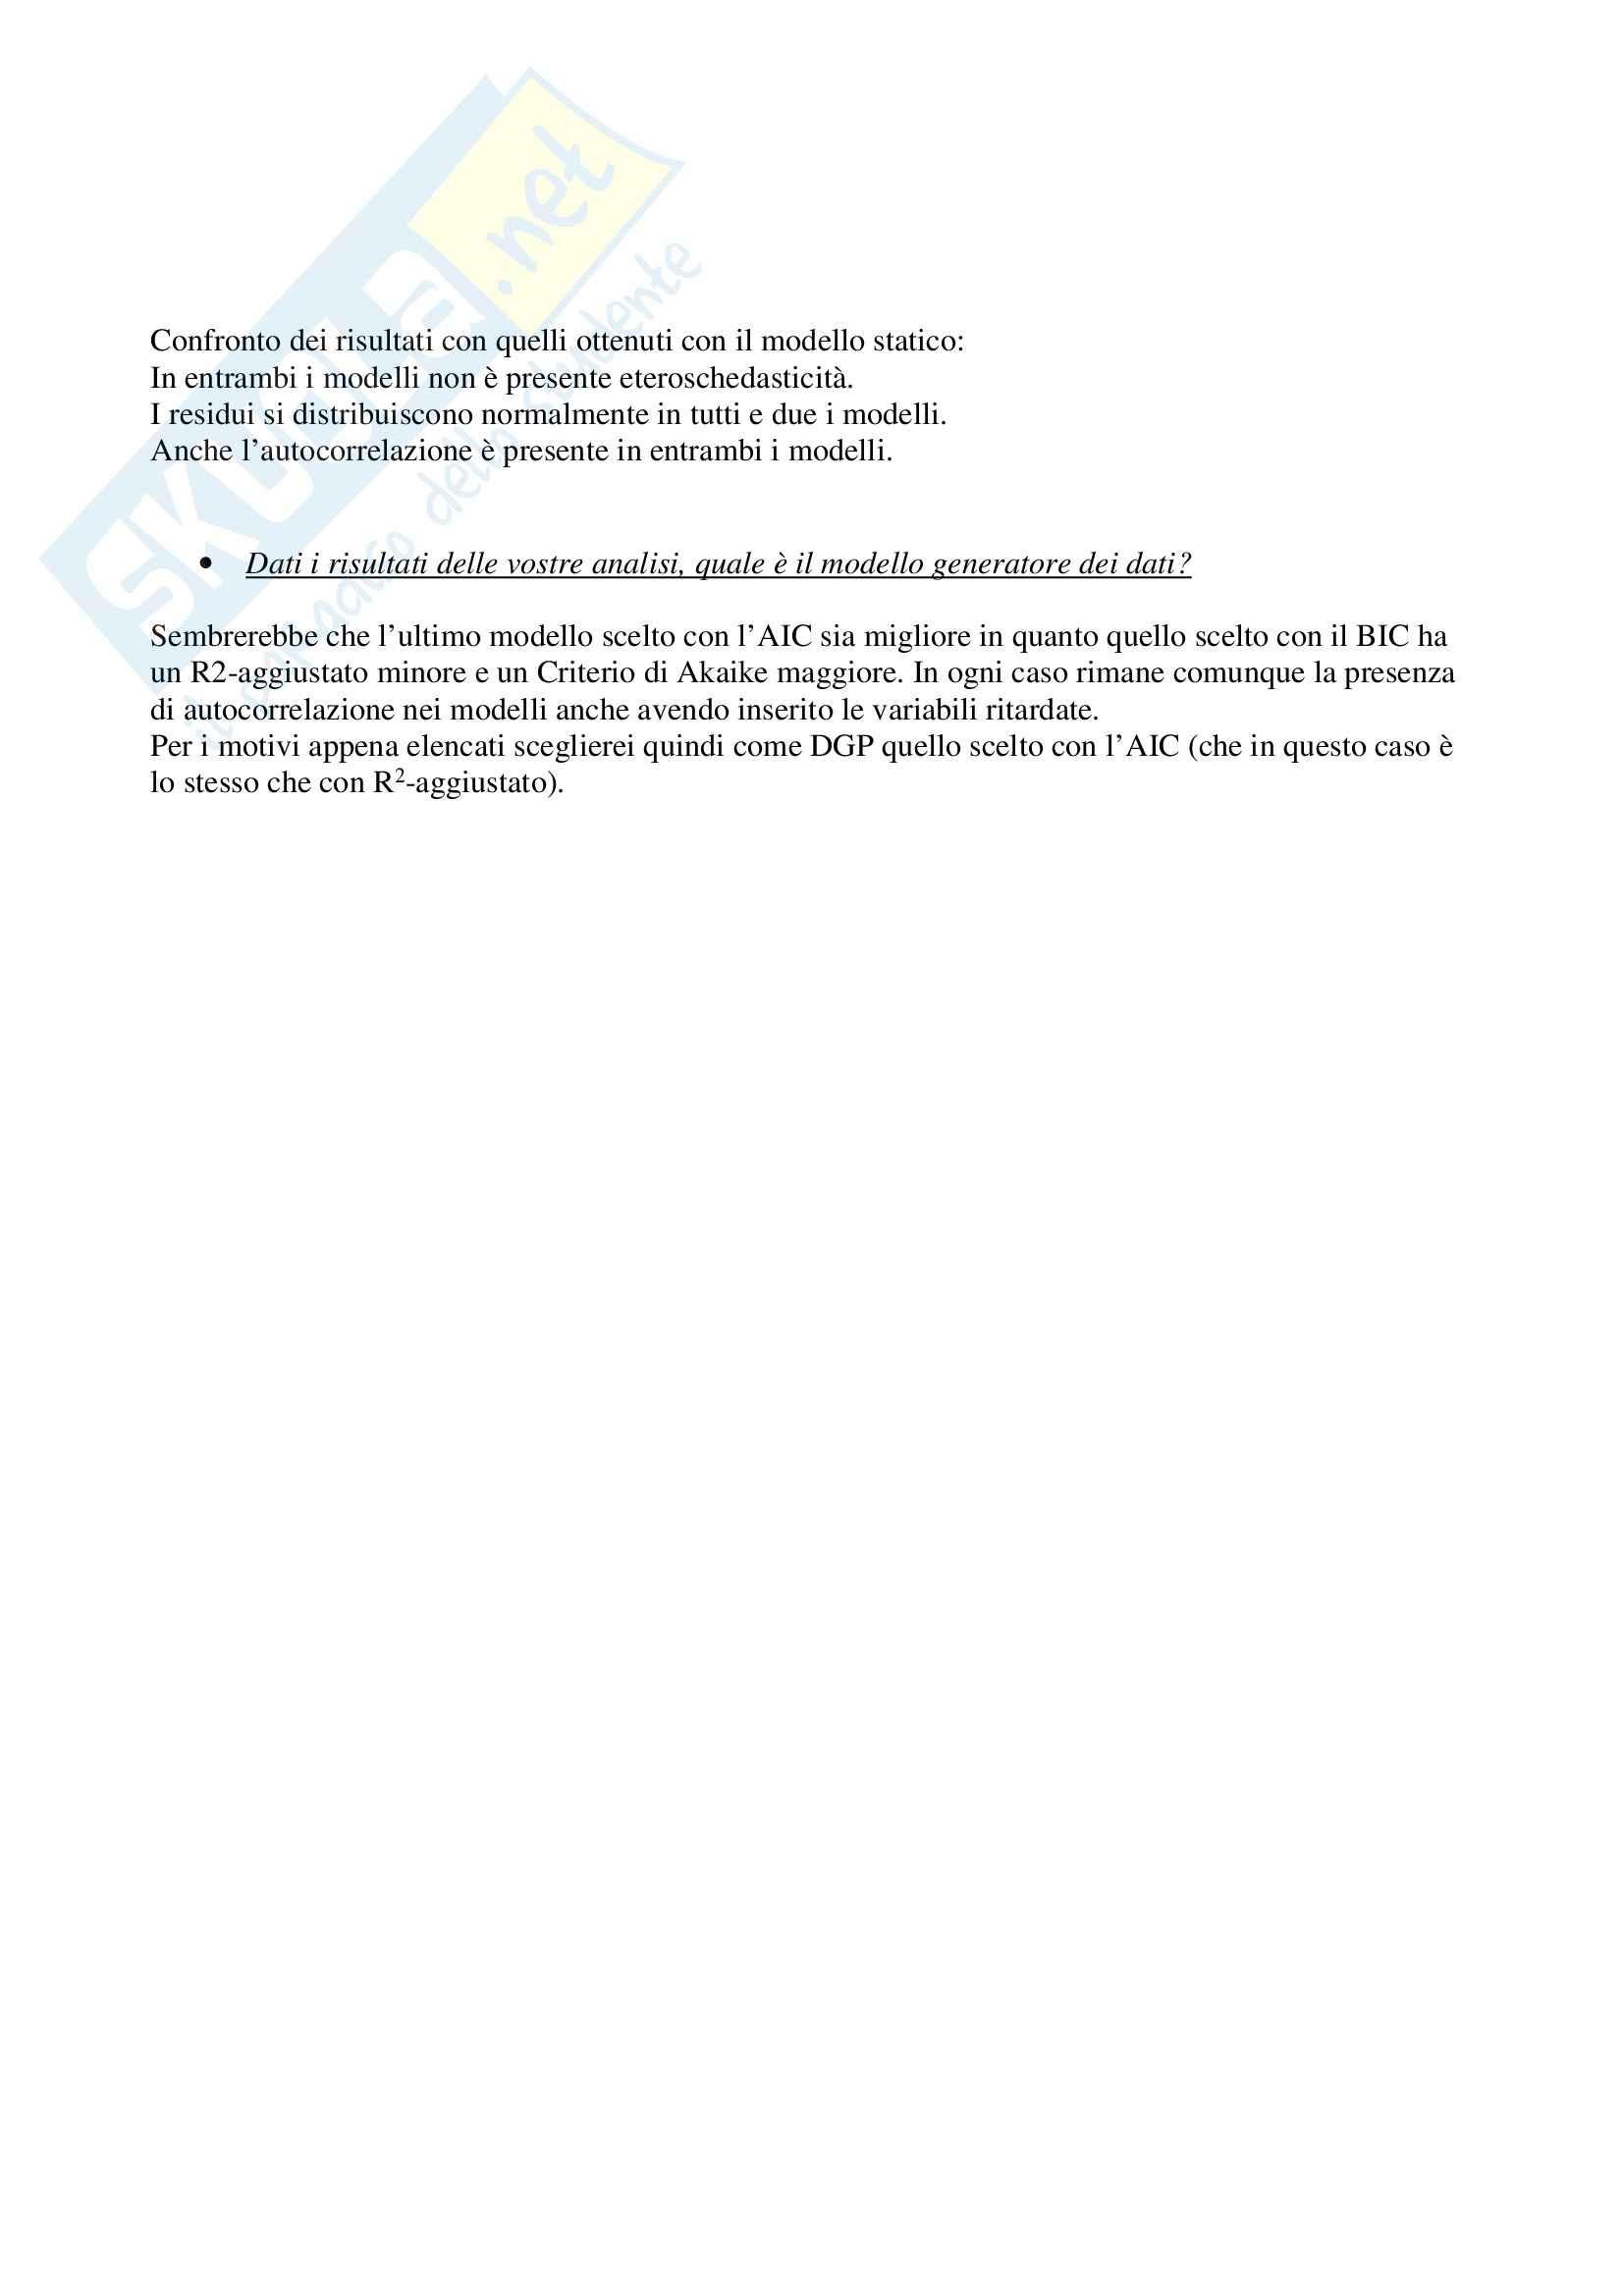 Introduzione all'Econometria - Prova pratica Pag. 11